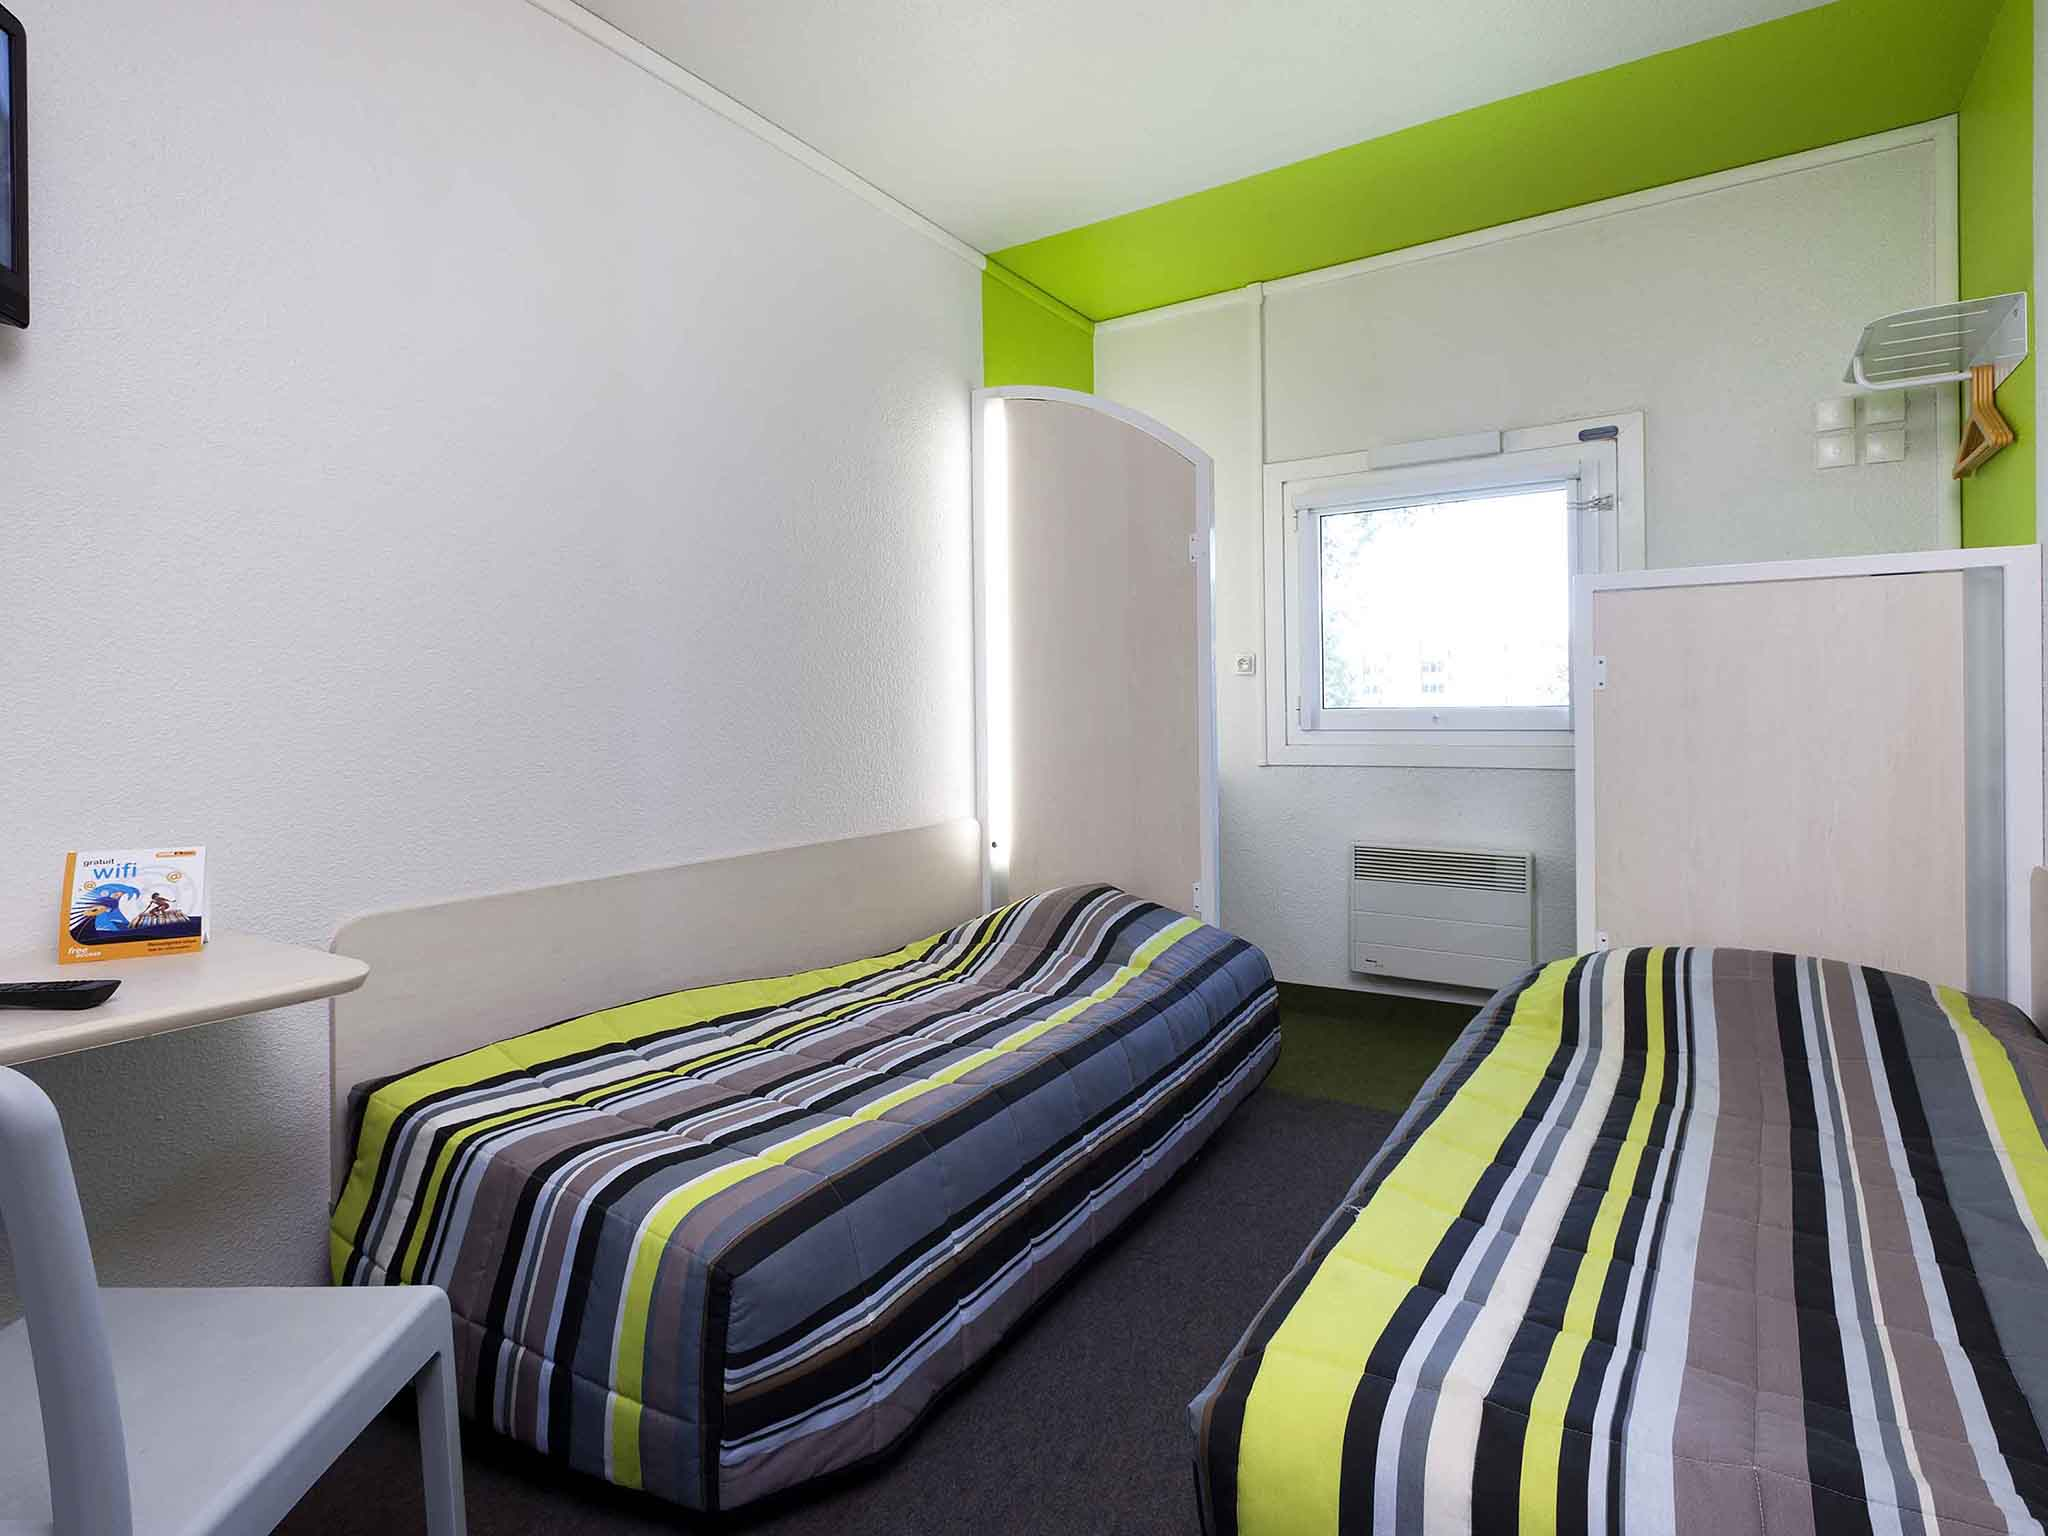 Отель — hotelF1 Valenciennes Douchy-les-Mines